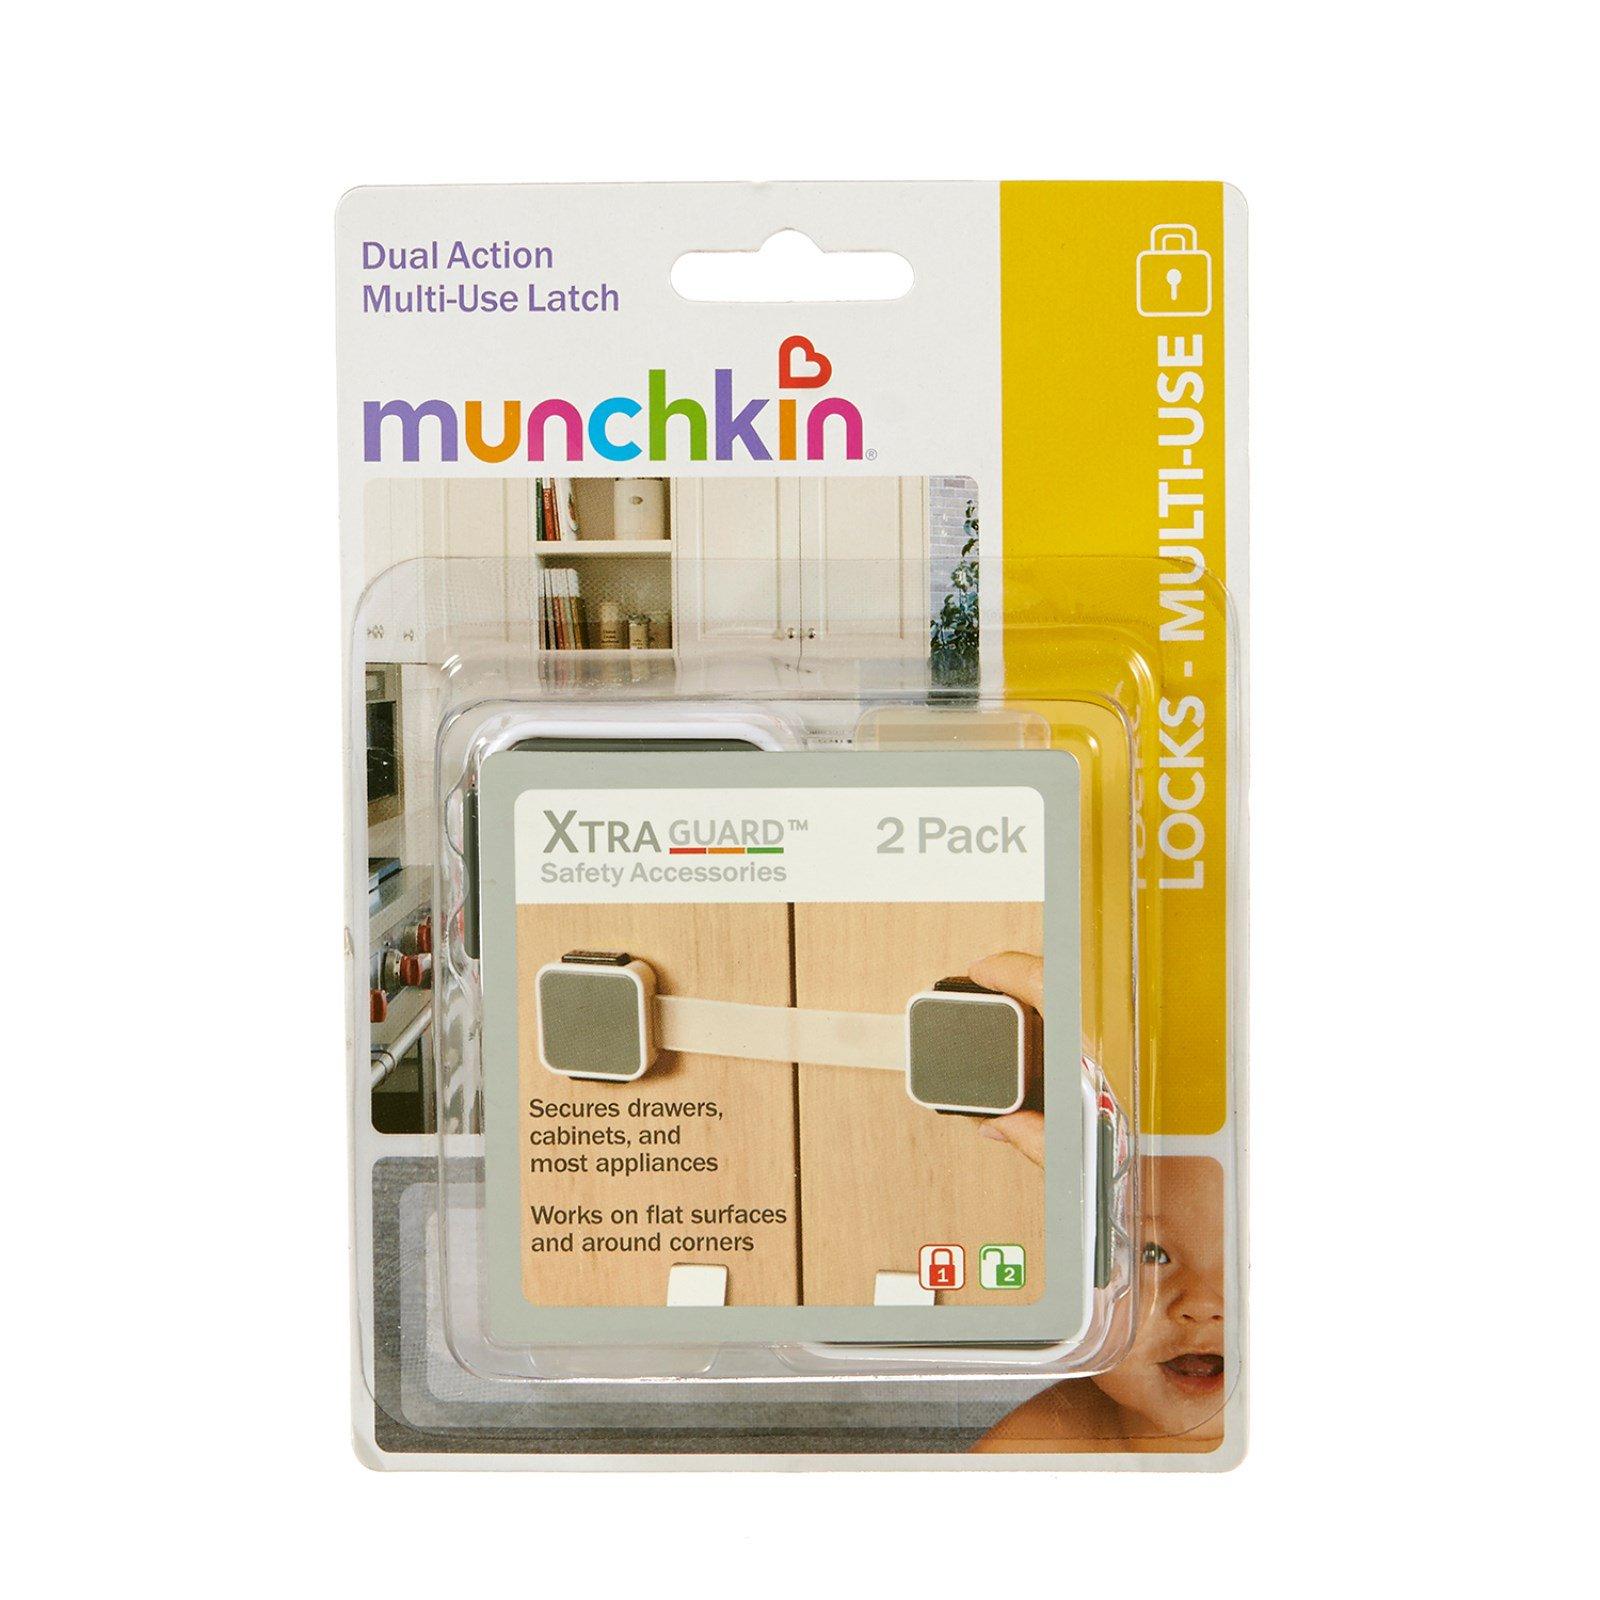 Munchkin, Safety, XtraGuard, Dual Locking Multi Use Latch, 2 Pack